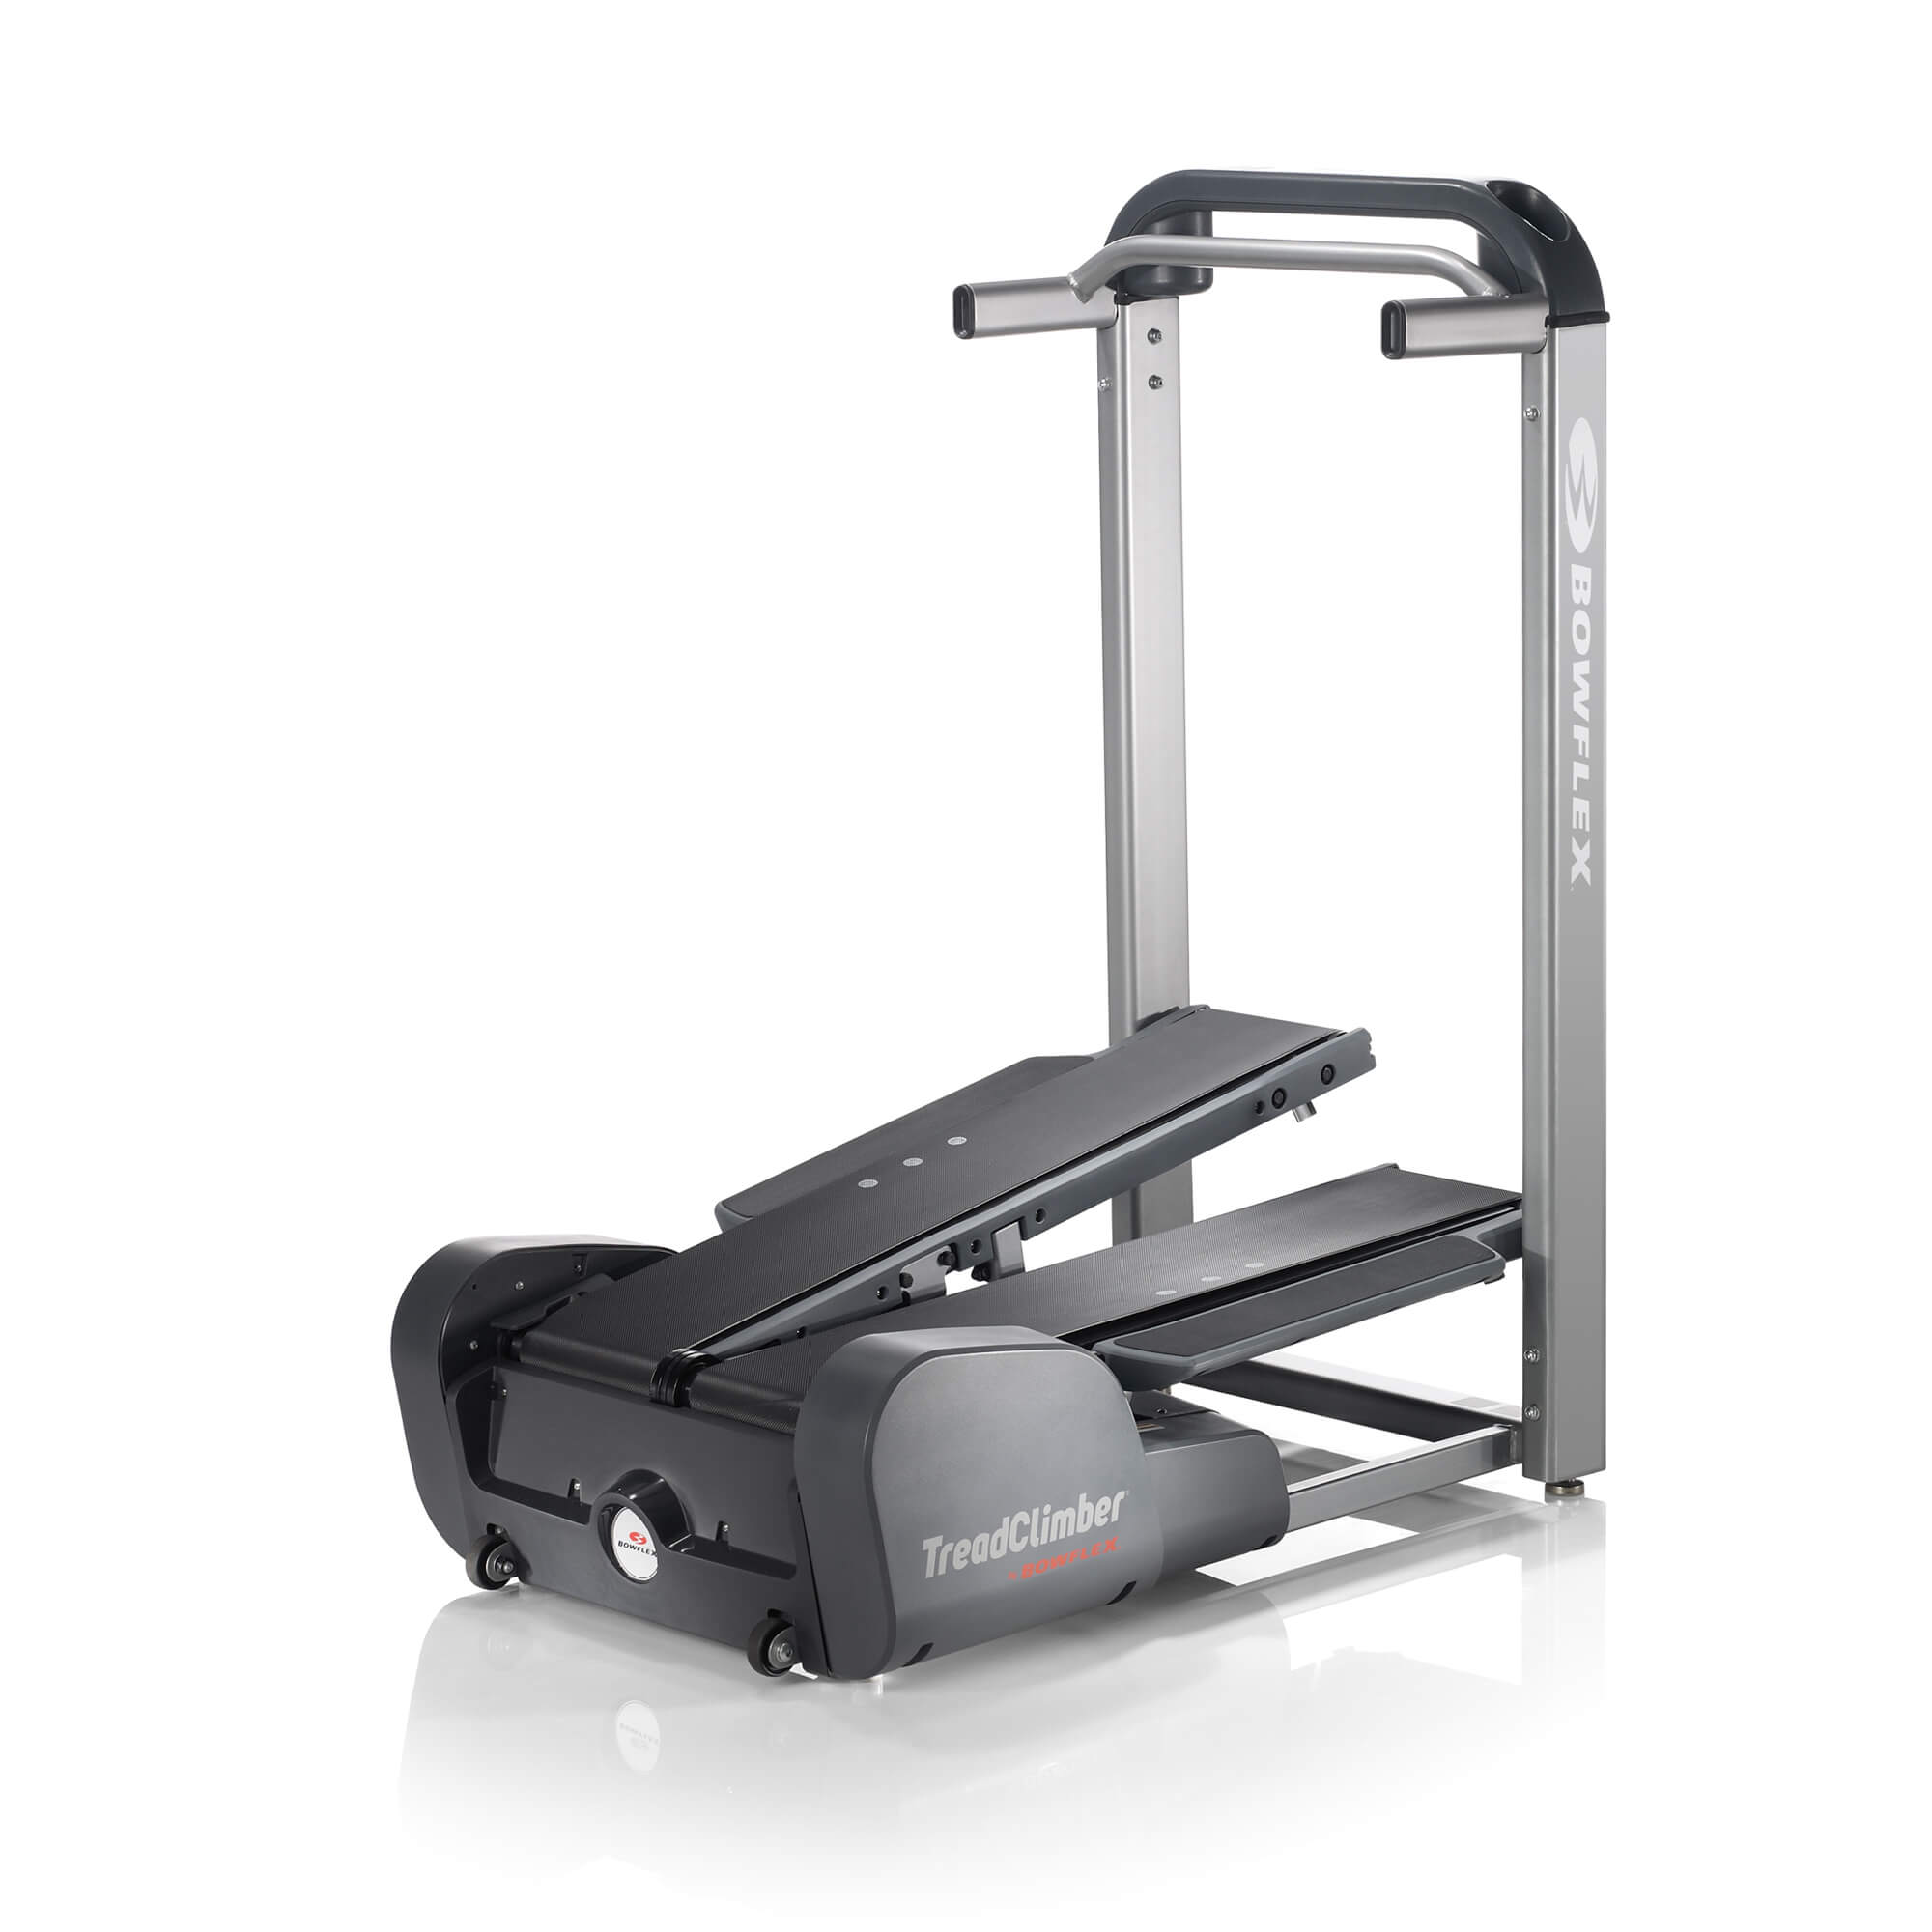 Bowflex Treadclimber Workout Program | Male Models Picture